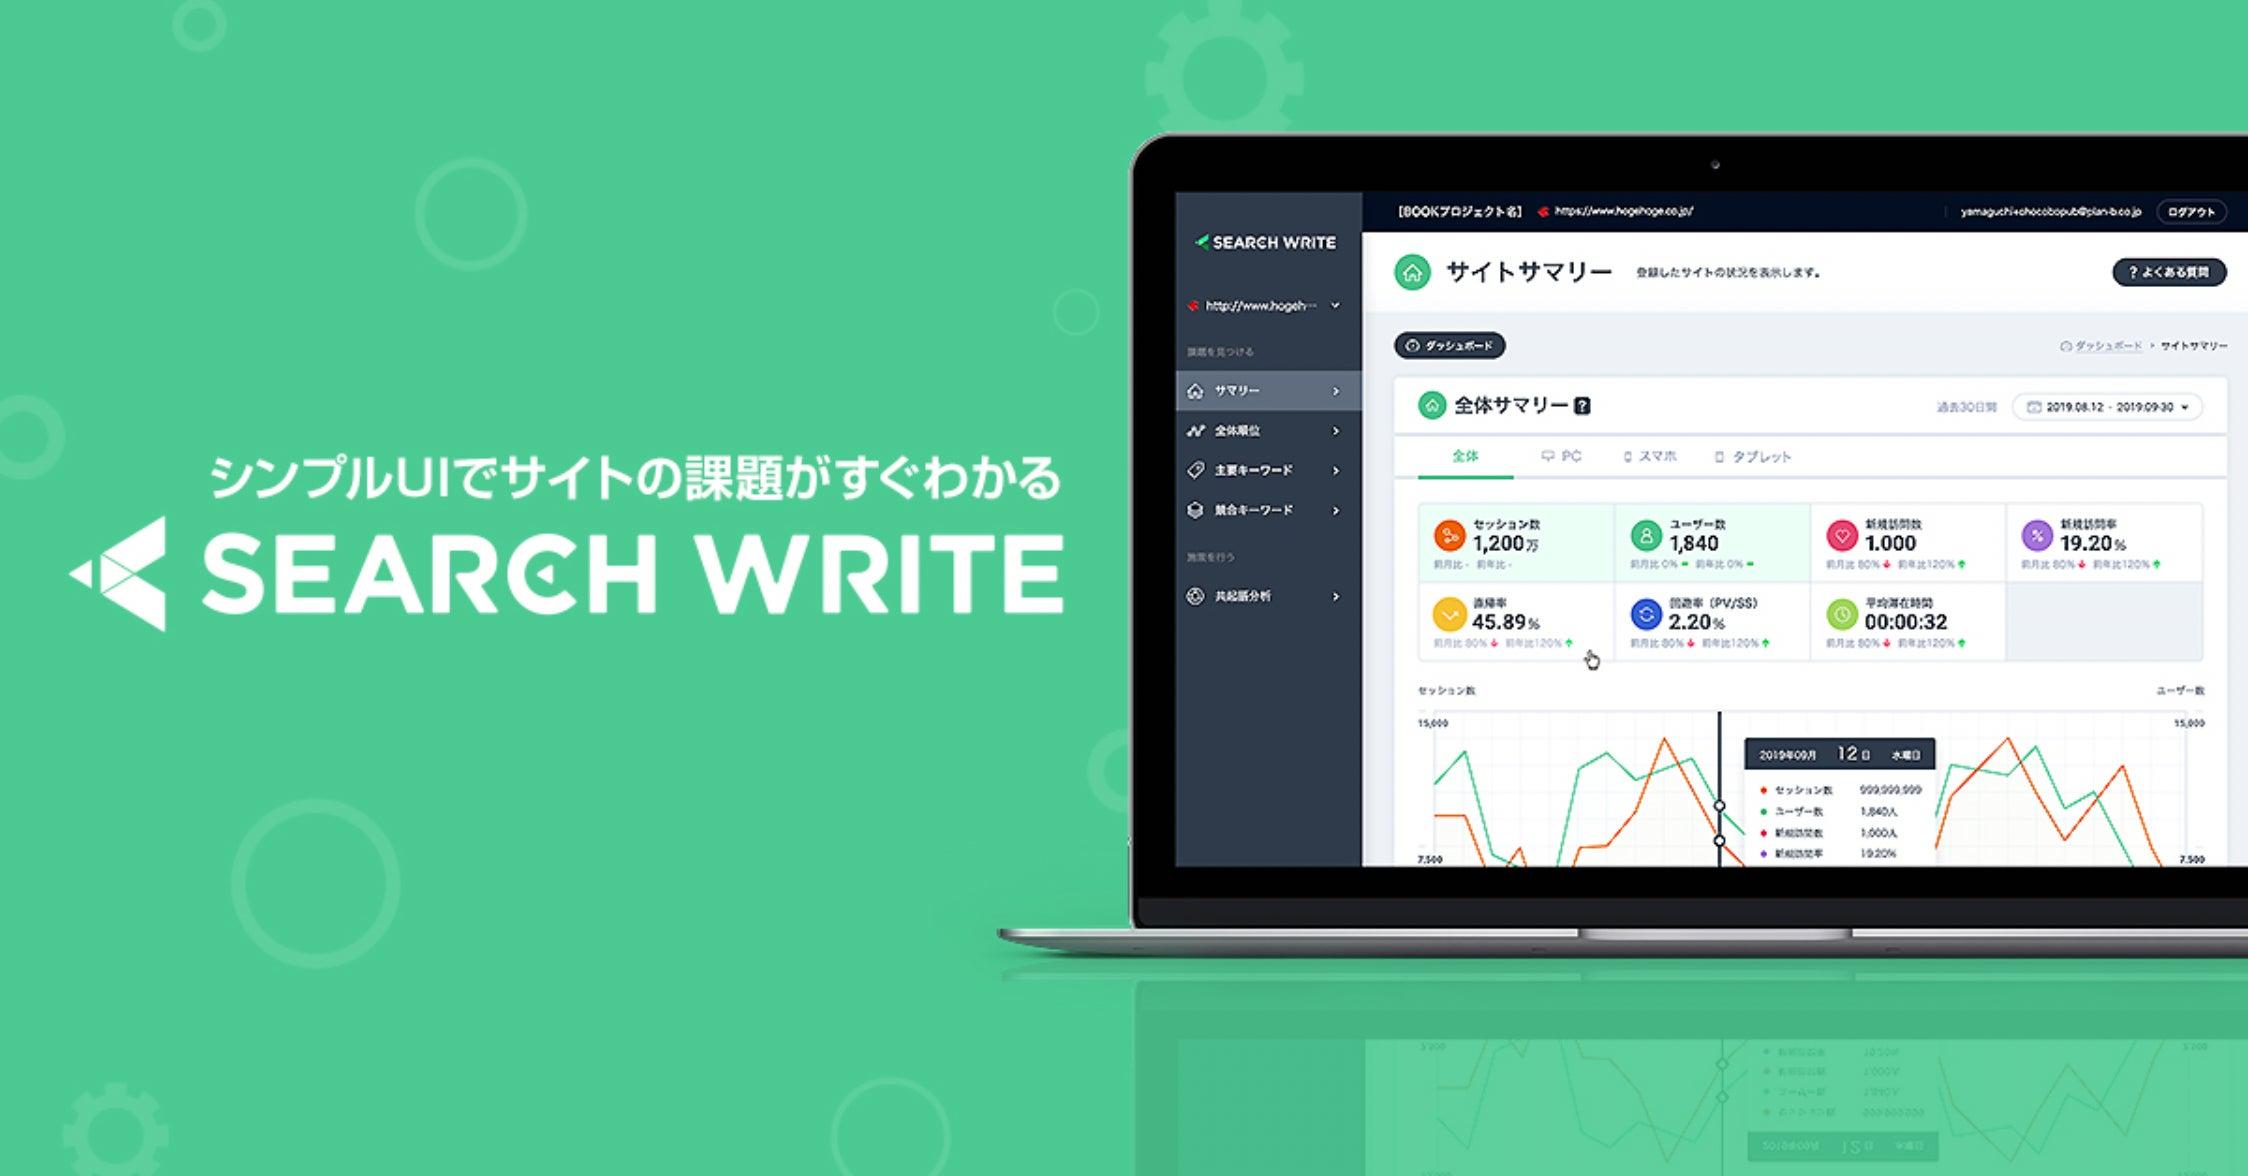 SEARCHWRITEのイメージ